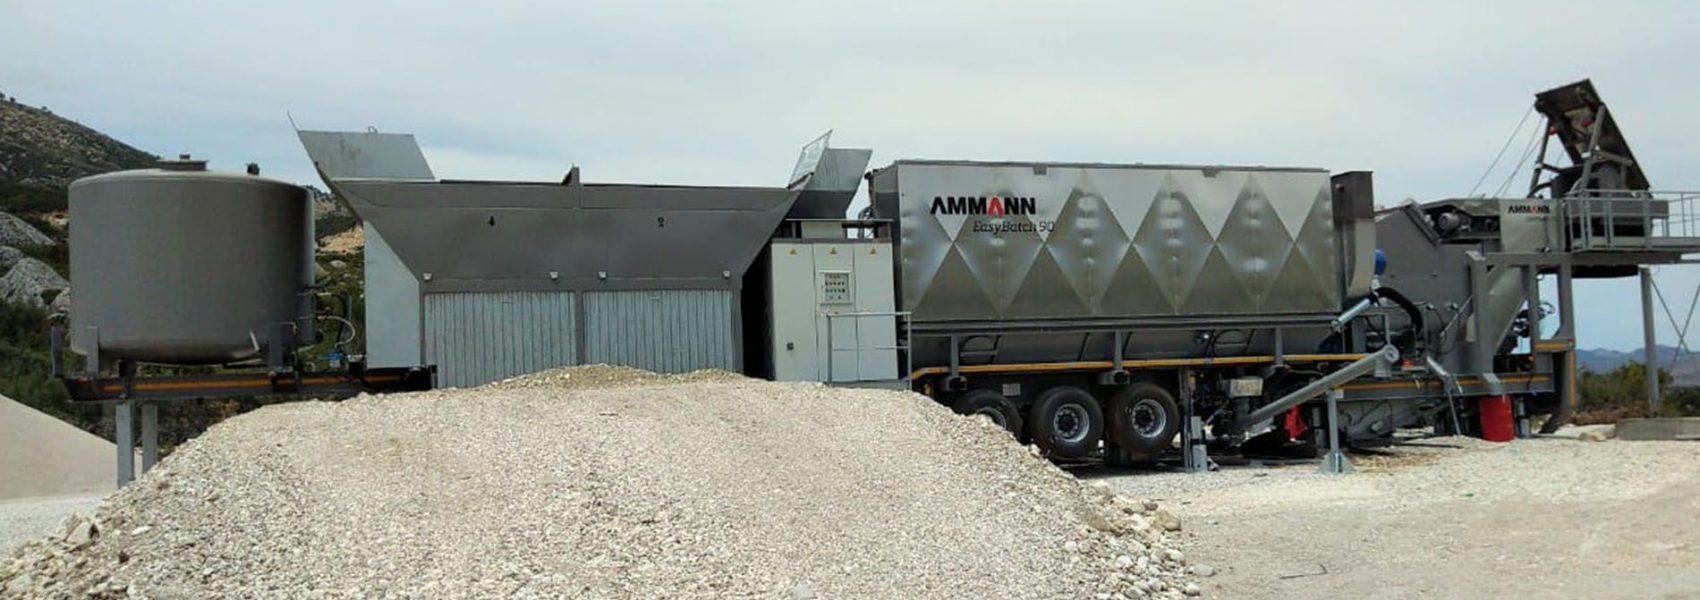 Impiant Asfalti I levizshem Ammann EB90